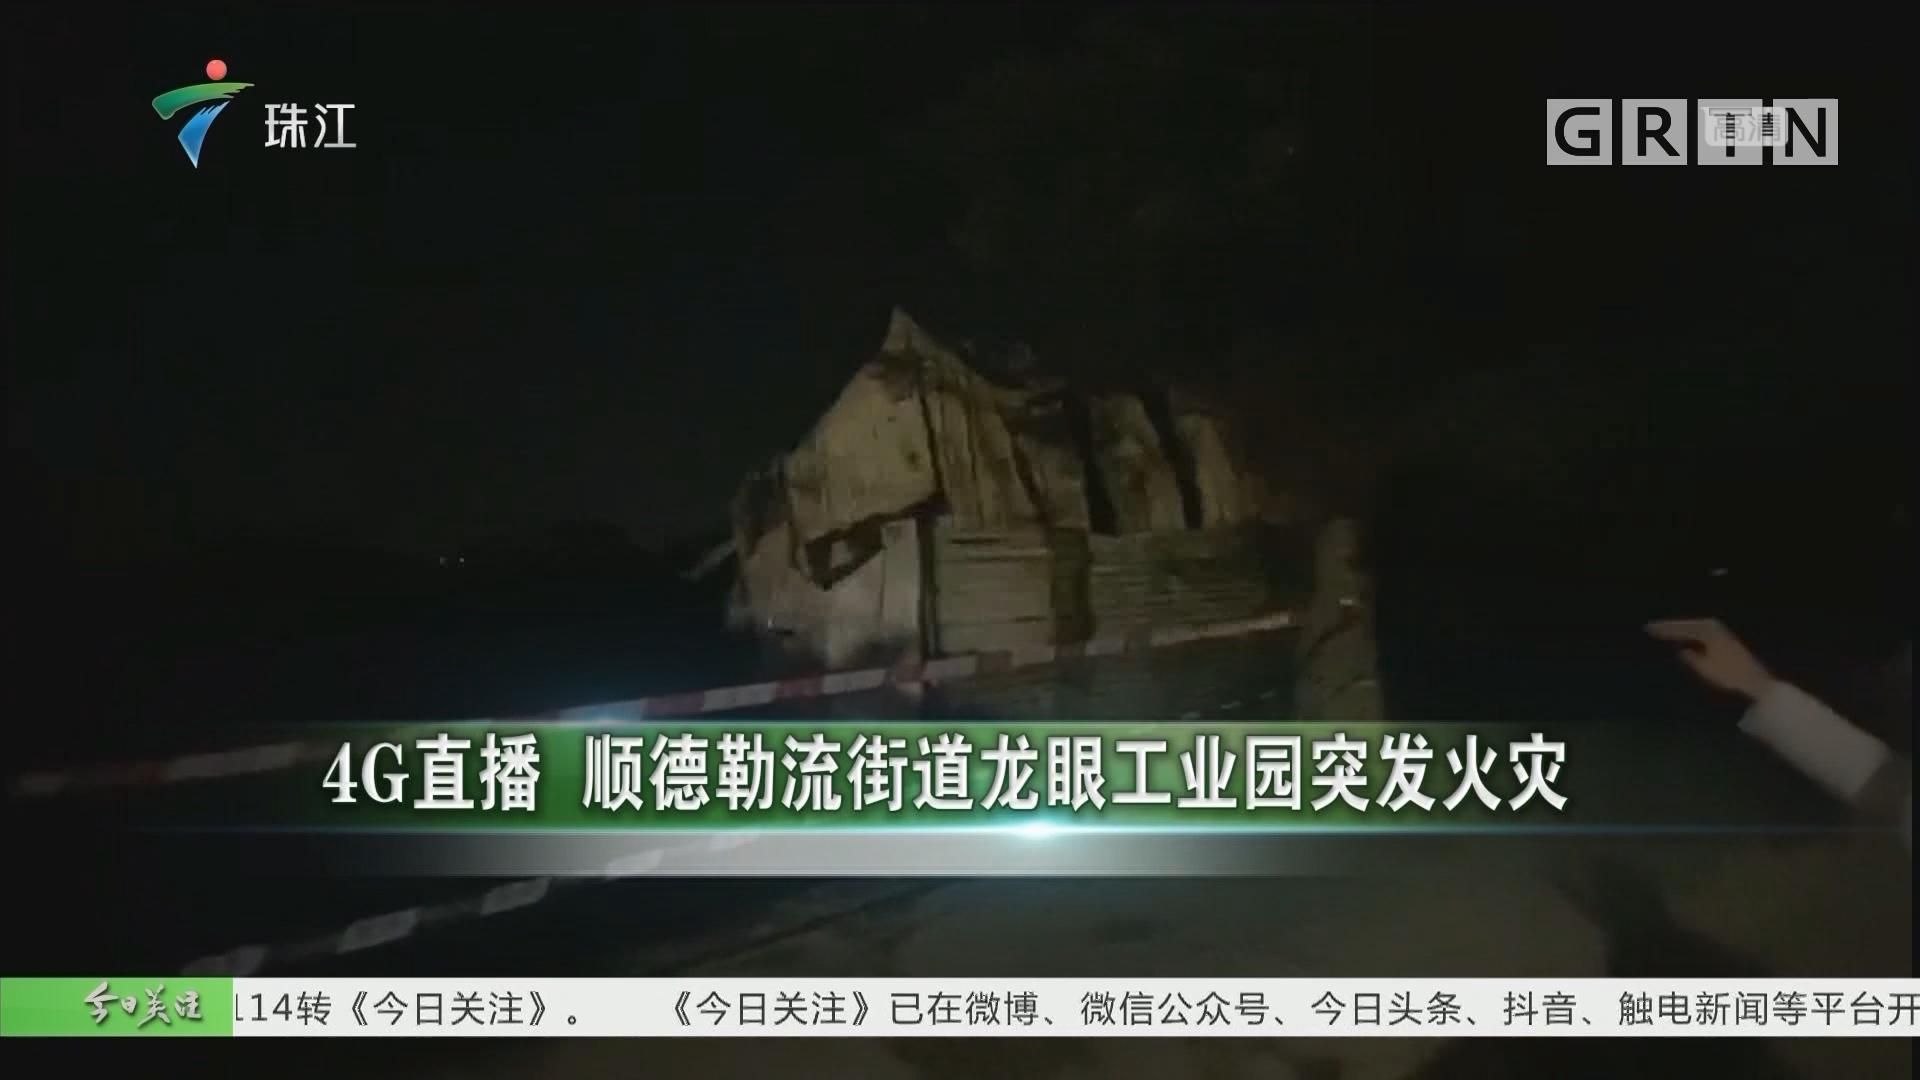 4G直播 顺德勒流街道龙眼工业园突发火灾